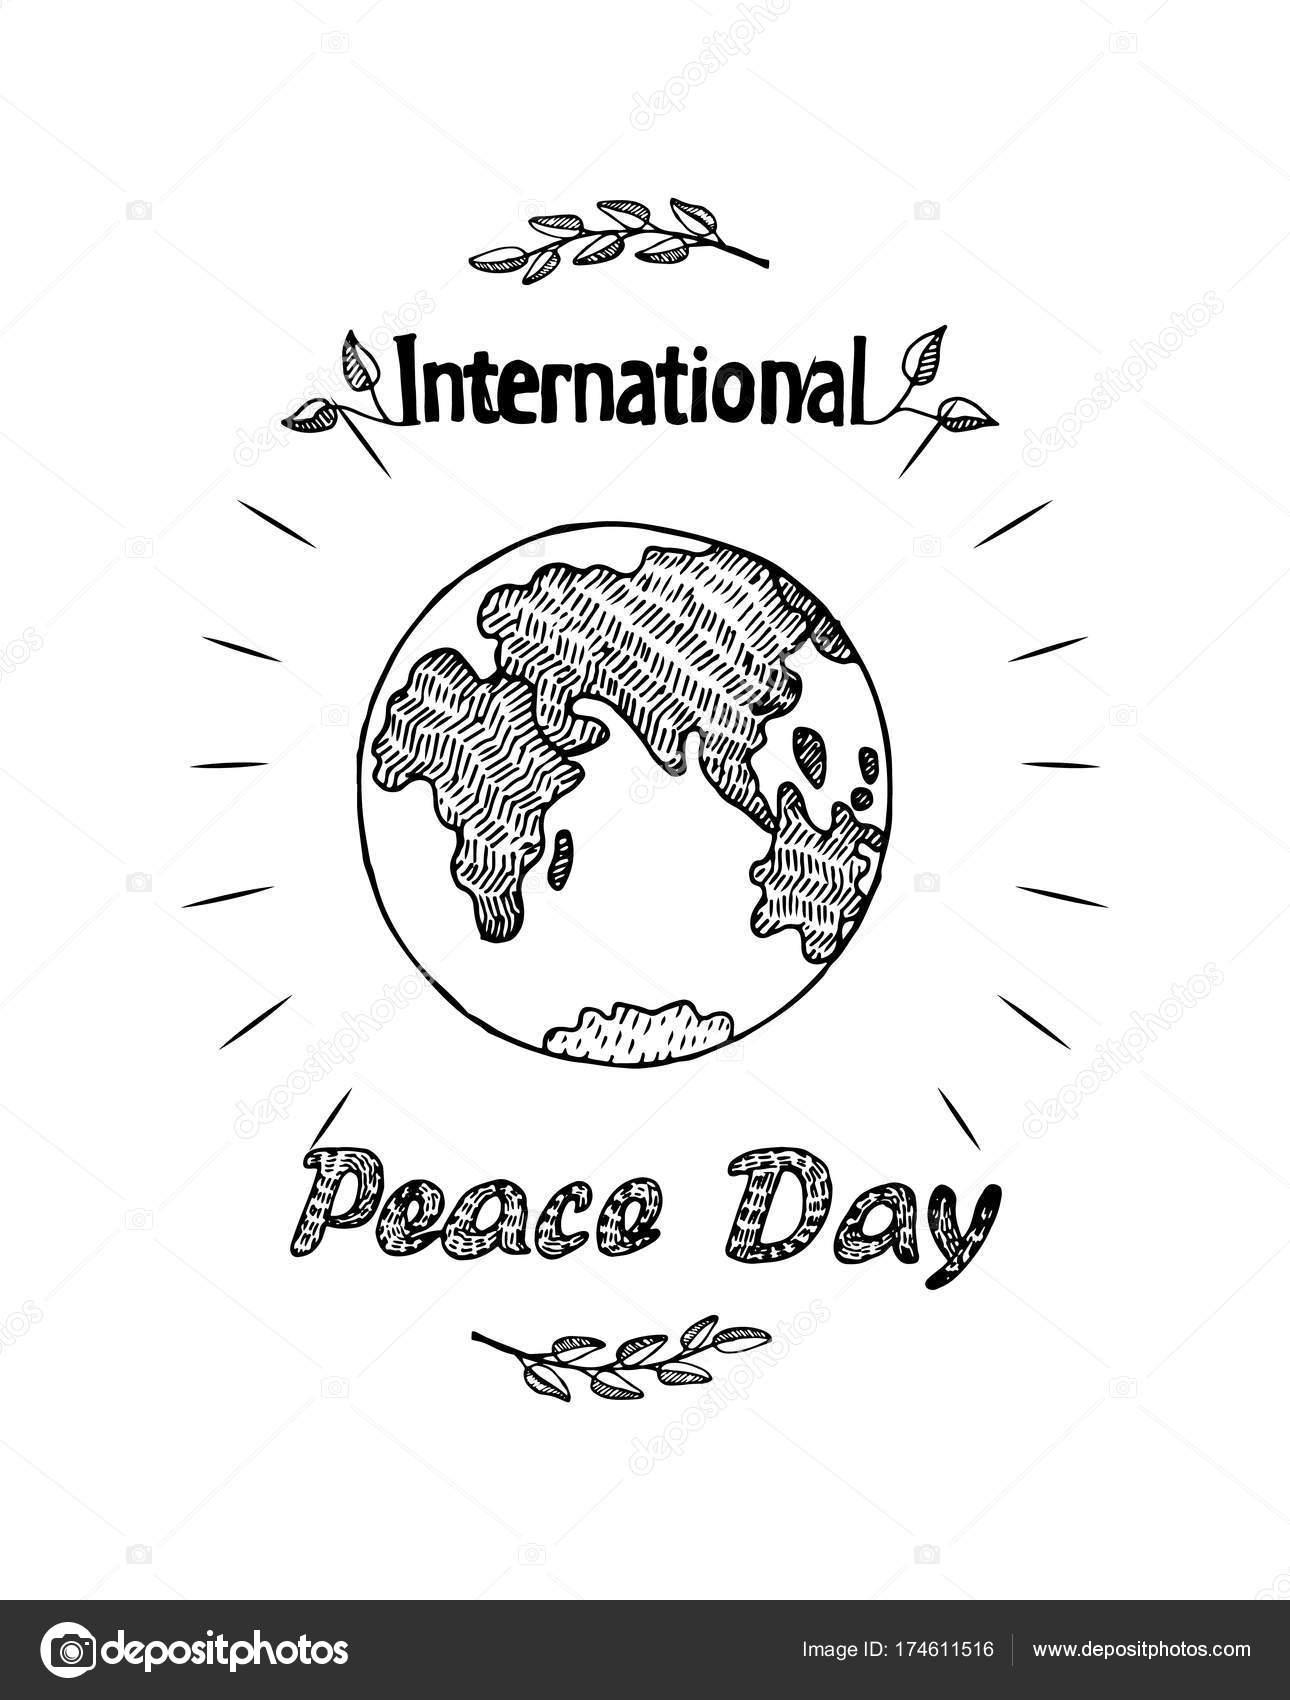 Ruhe Tag internationale Urlaub Poster mit Erde — Stockvektor ...